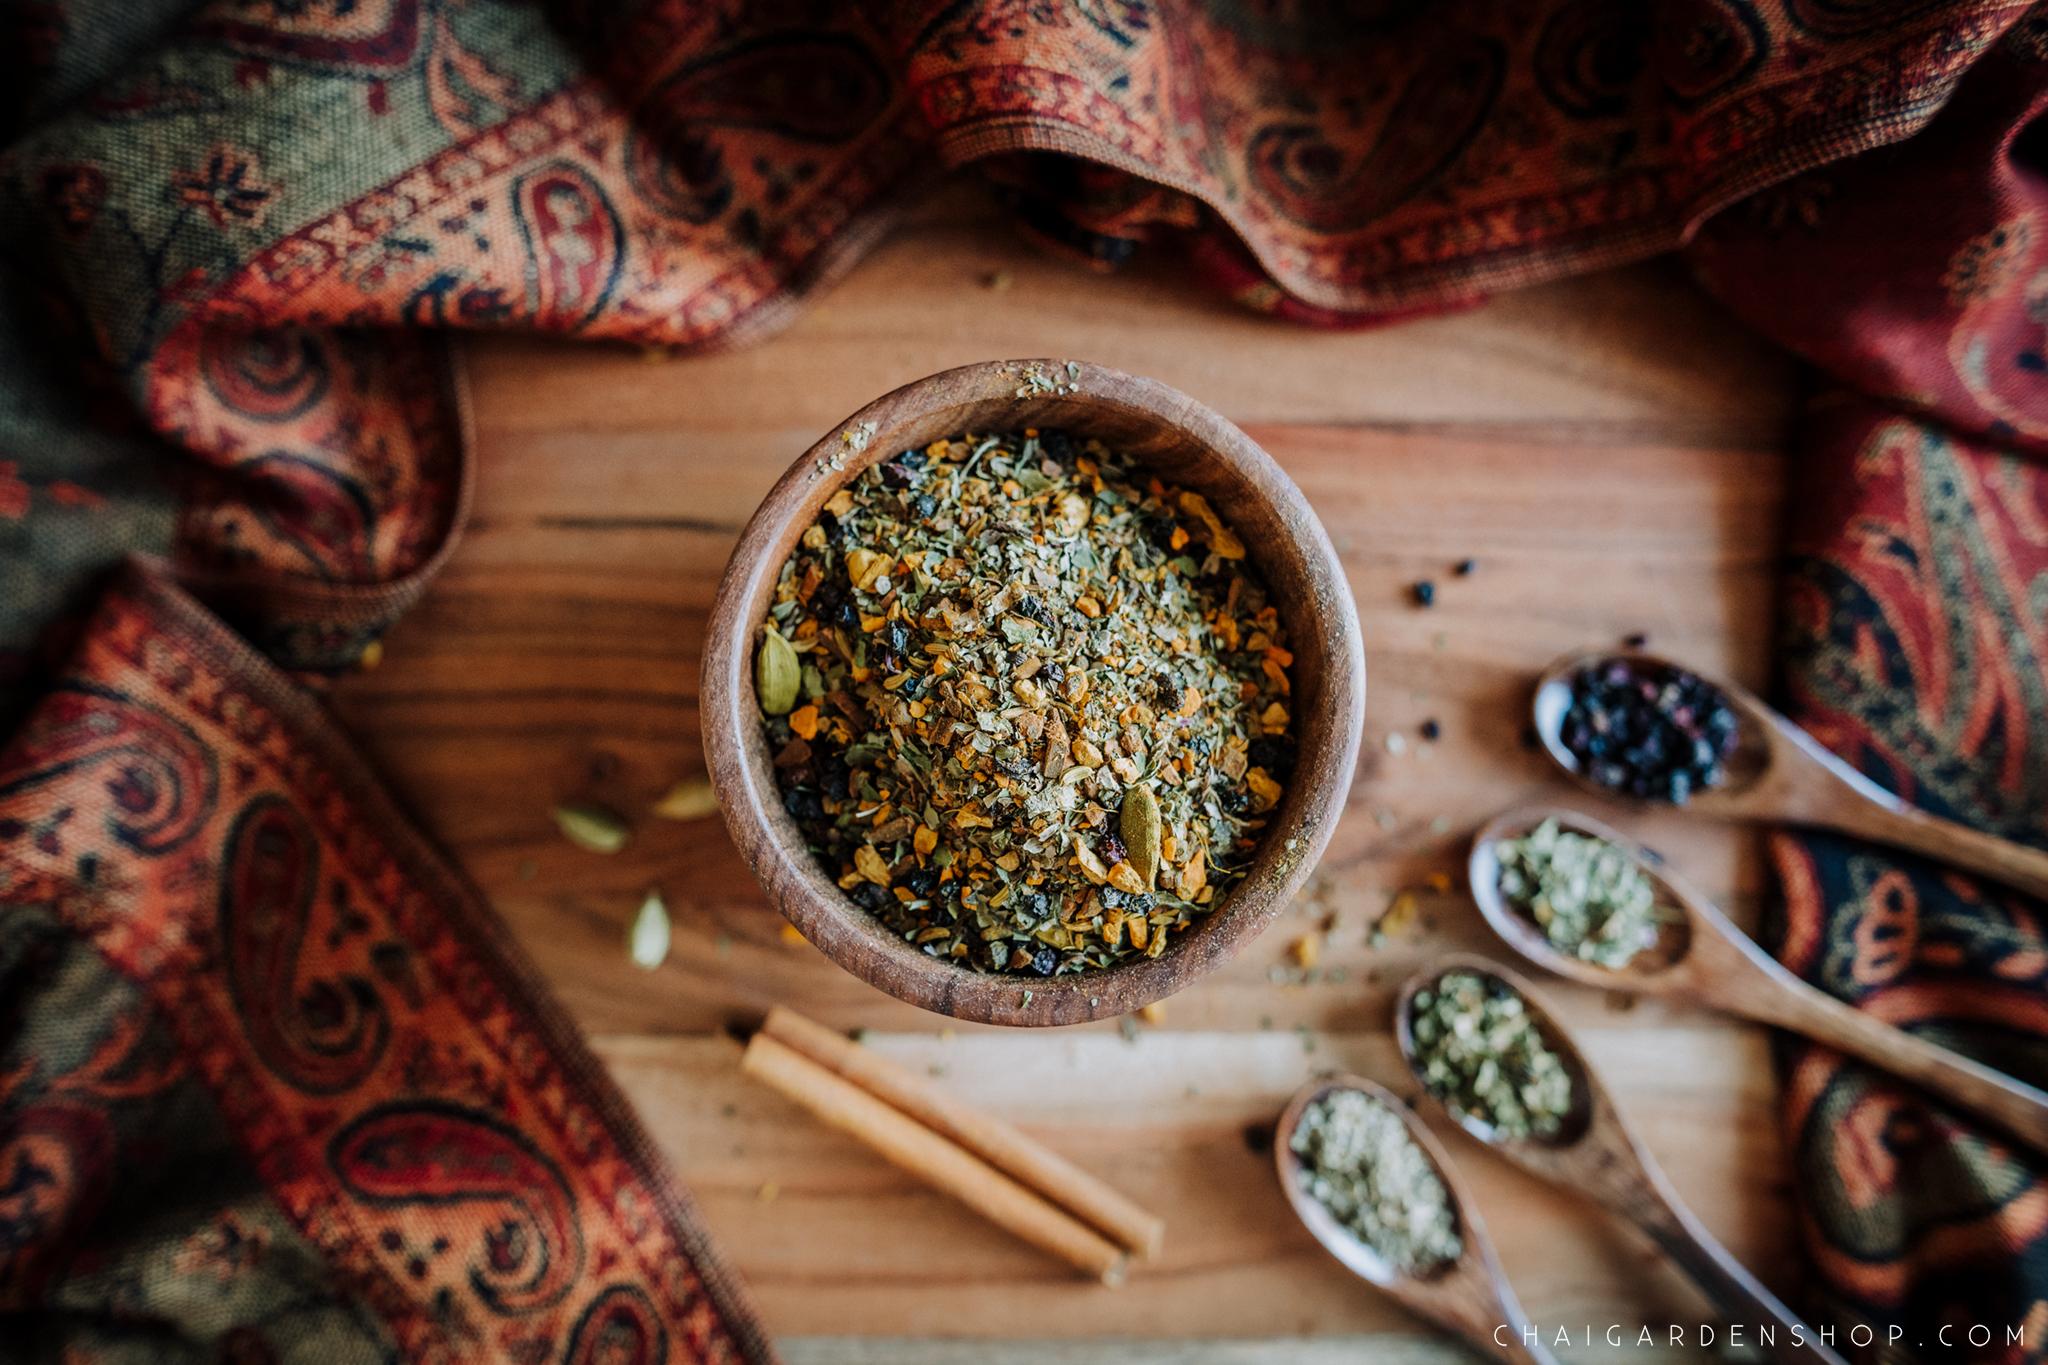 organic cold cure chai, organic elderberries, organic echinacea, organic peppermint, organic rosemary